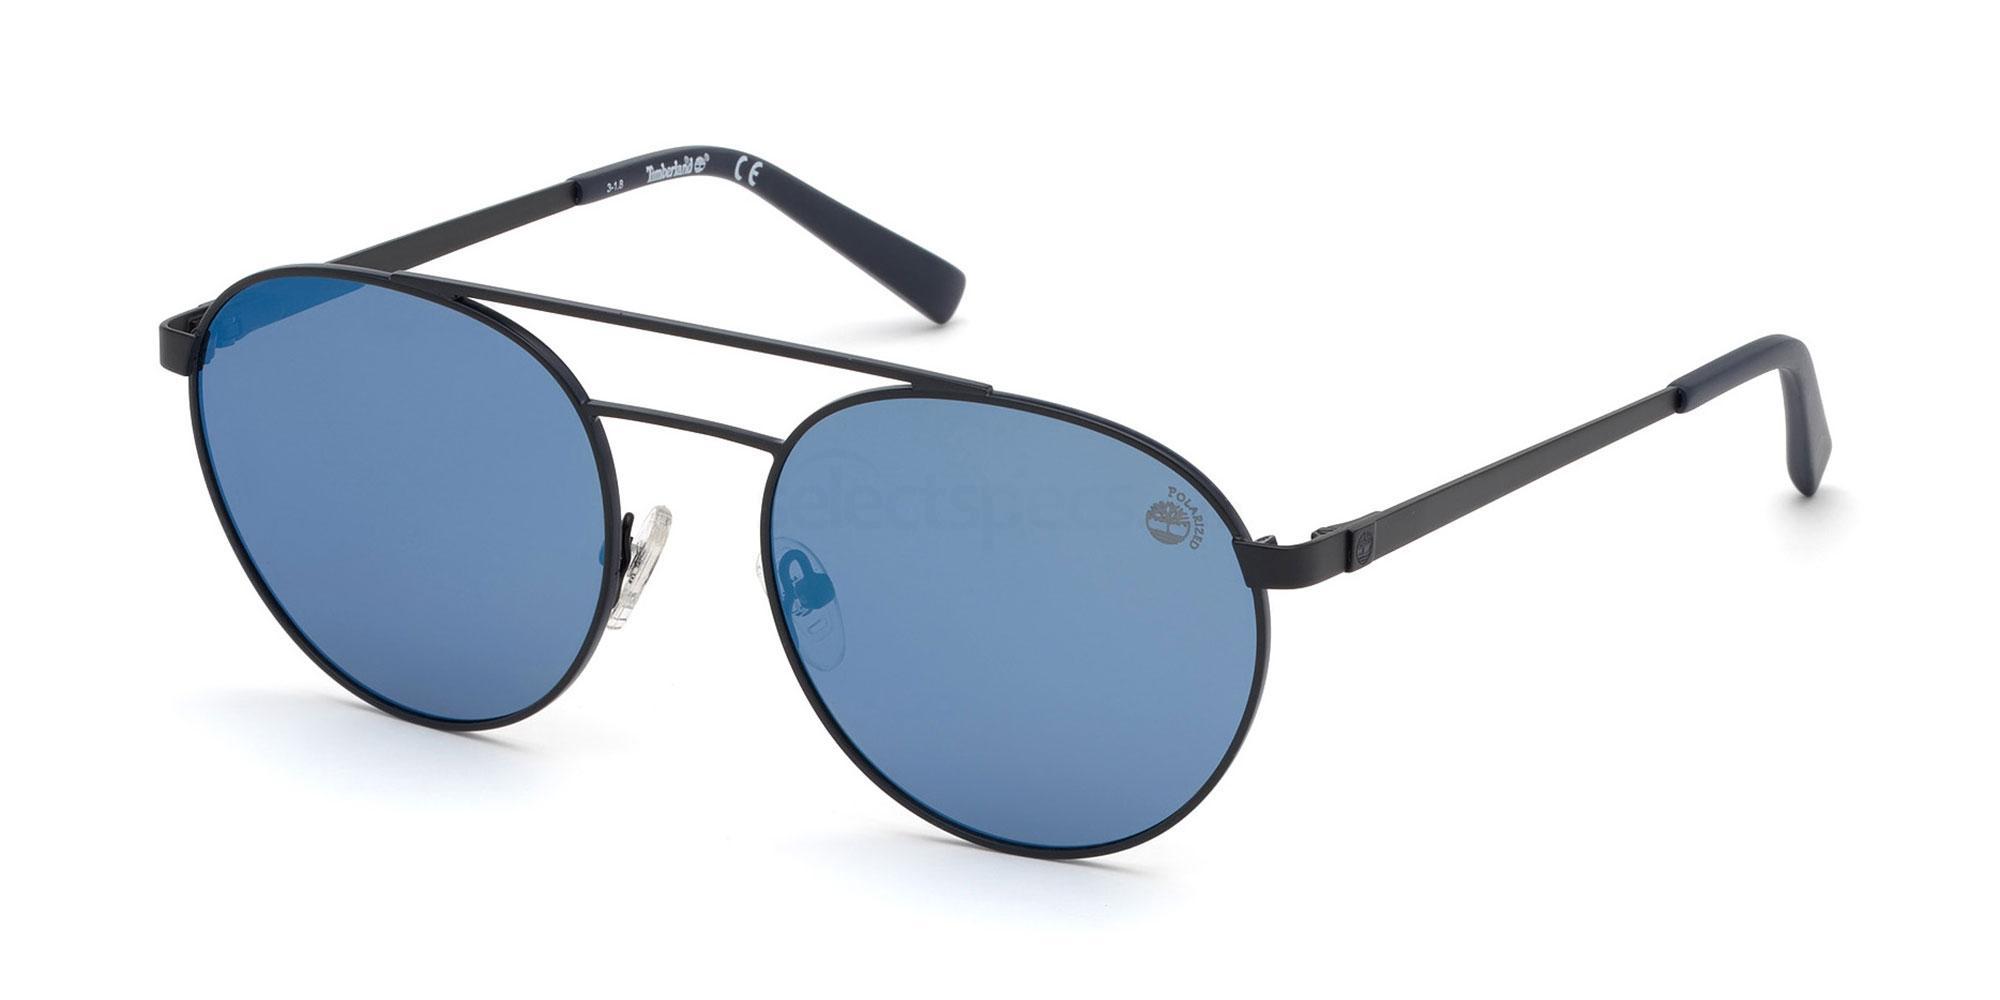 02D TB9167 Sunglasses, Timberland